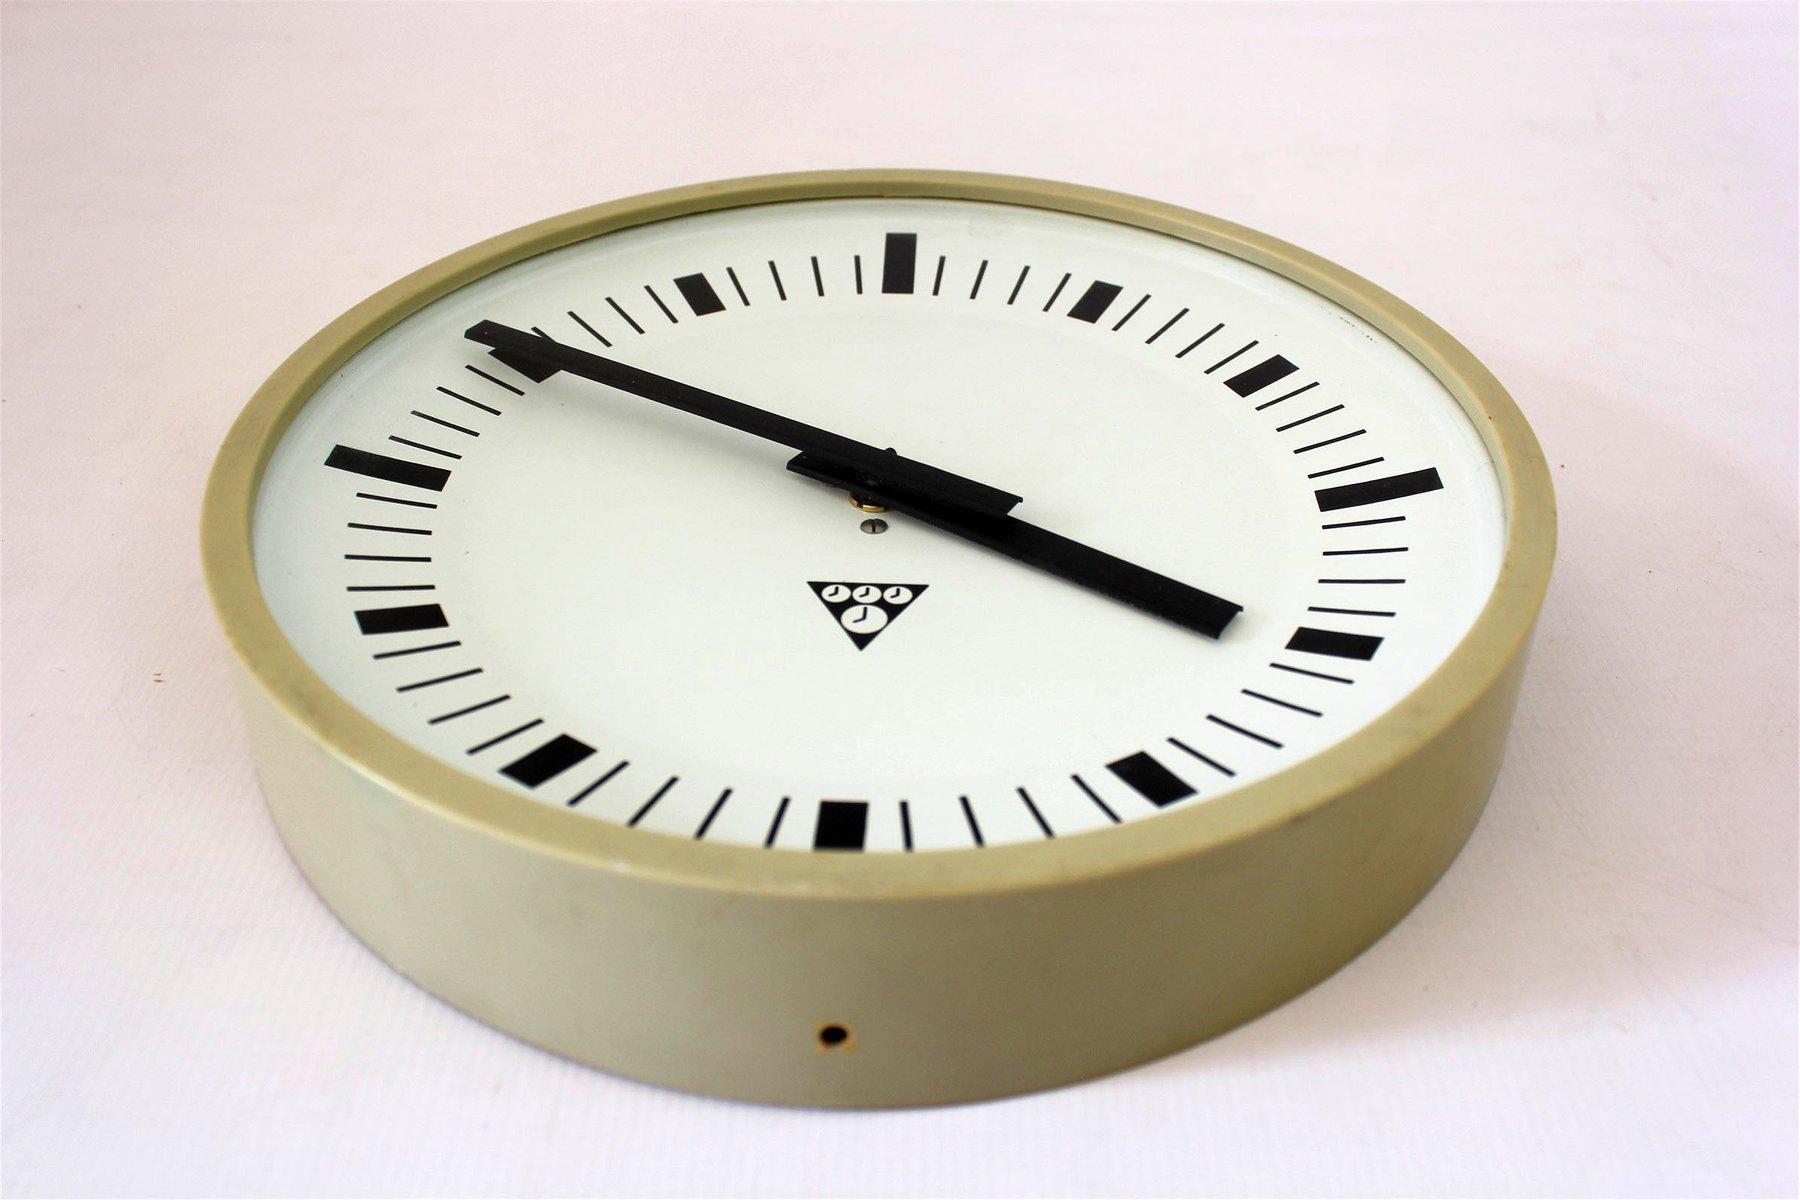 Vintage Railway Clock By Pragotron 1970s For Sale At Pamono